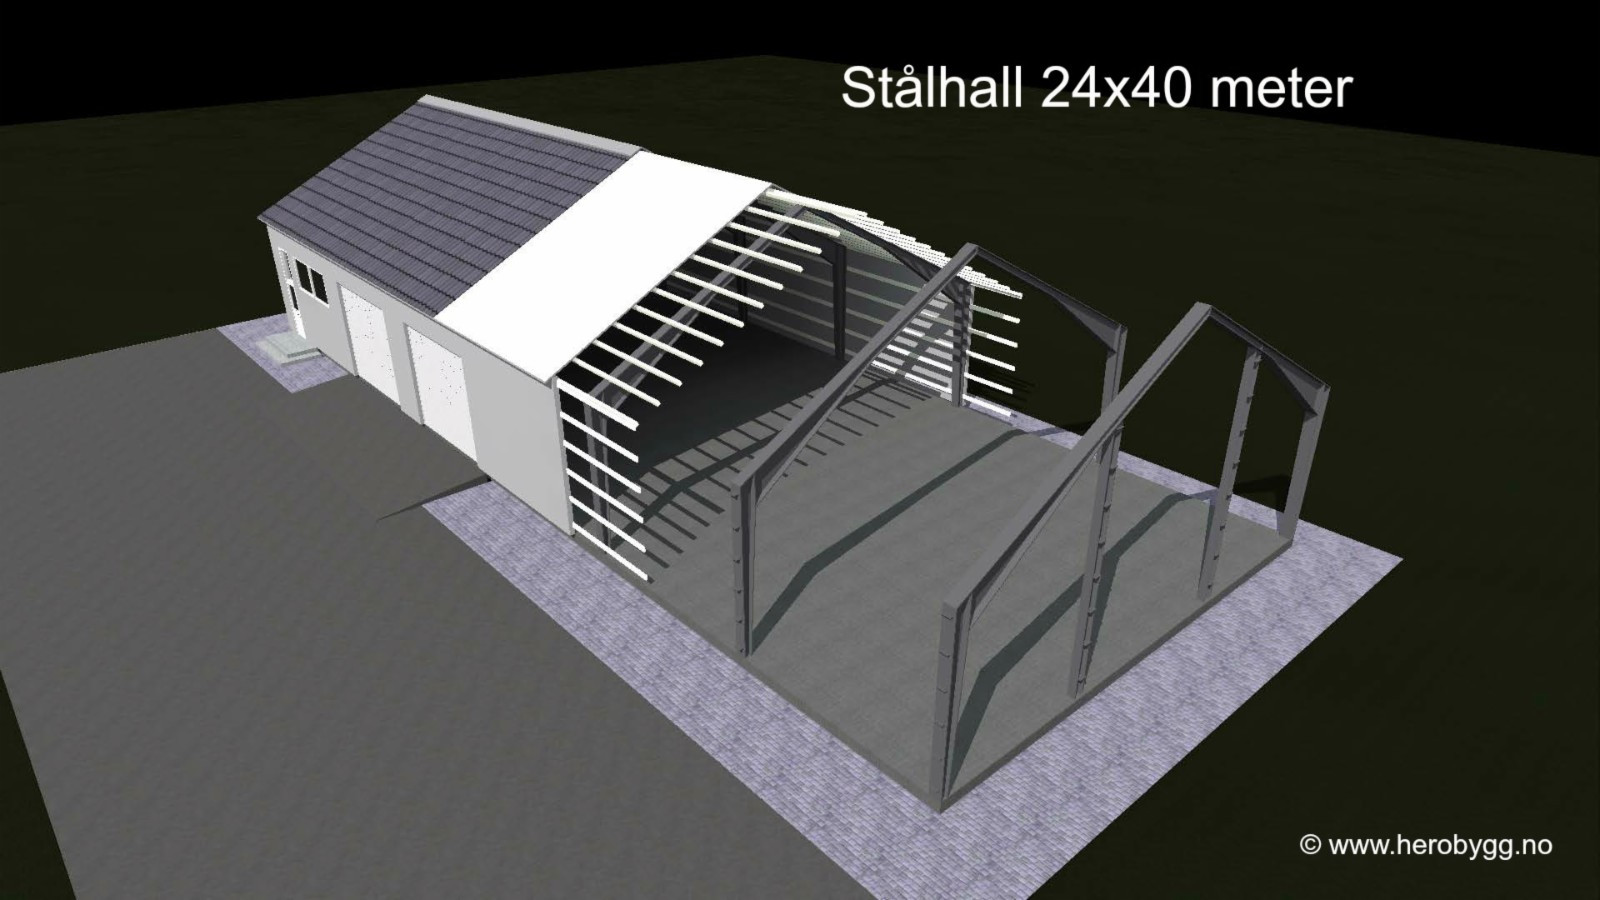 Wonderful 24x40 meter lagerhall, stålhall, garasje, landbruksbygg mm. selges UA-57